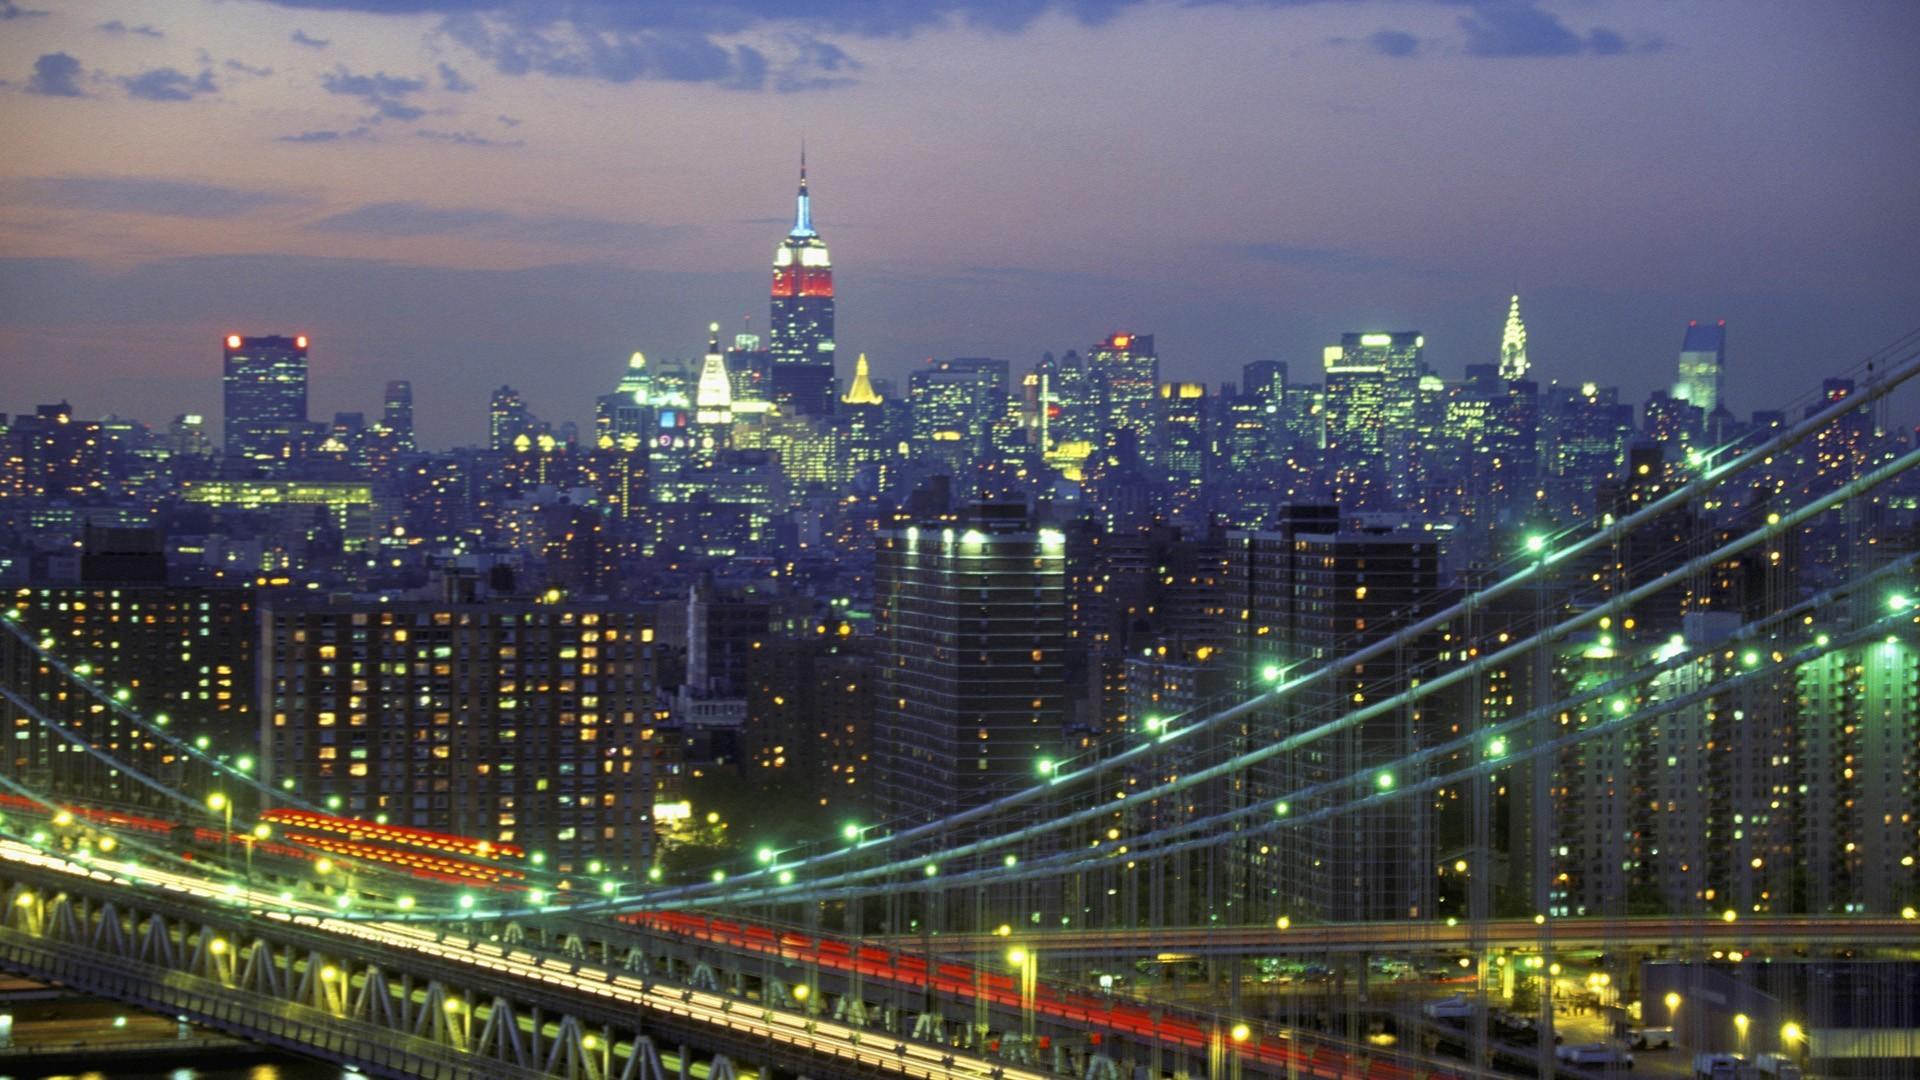 High Resolution New York Skyline at Night Wallpaper HD 17 City .